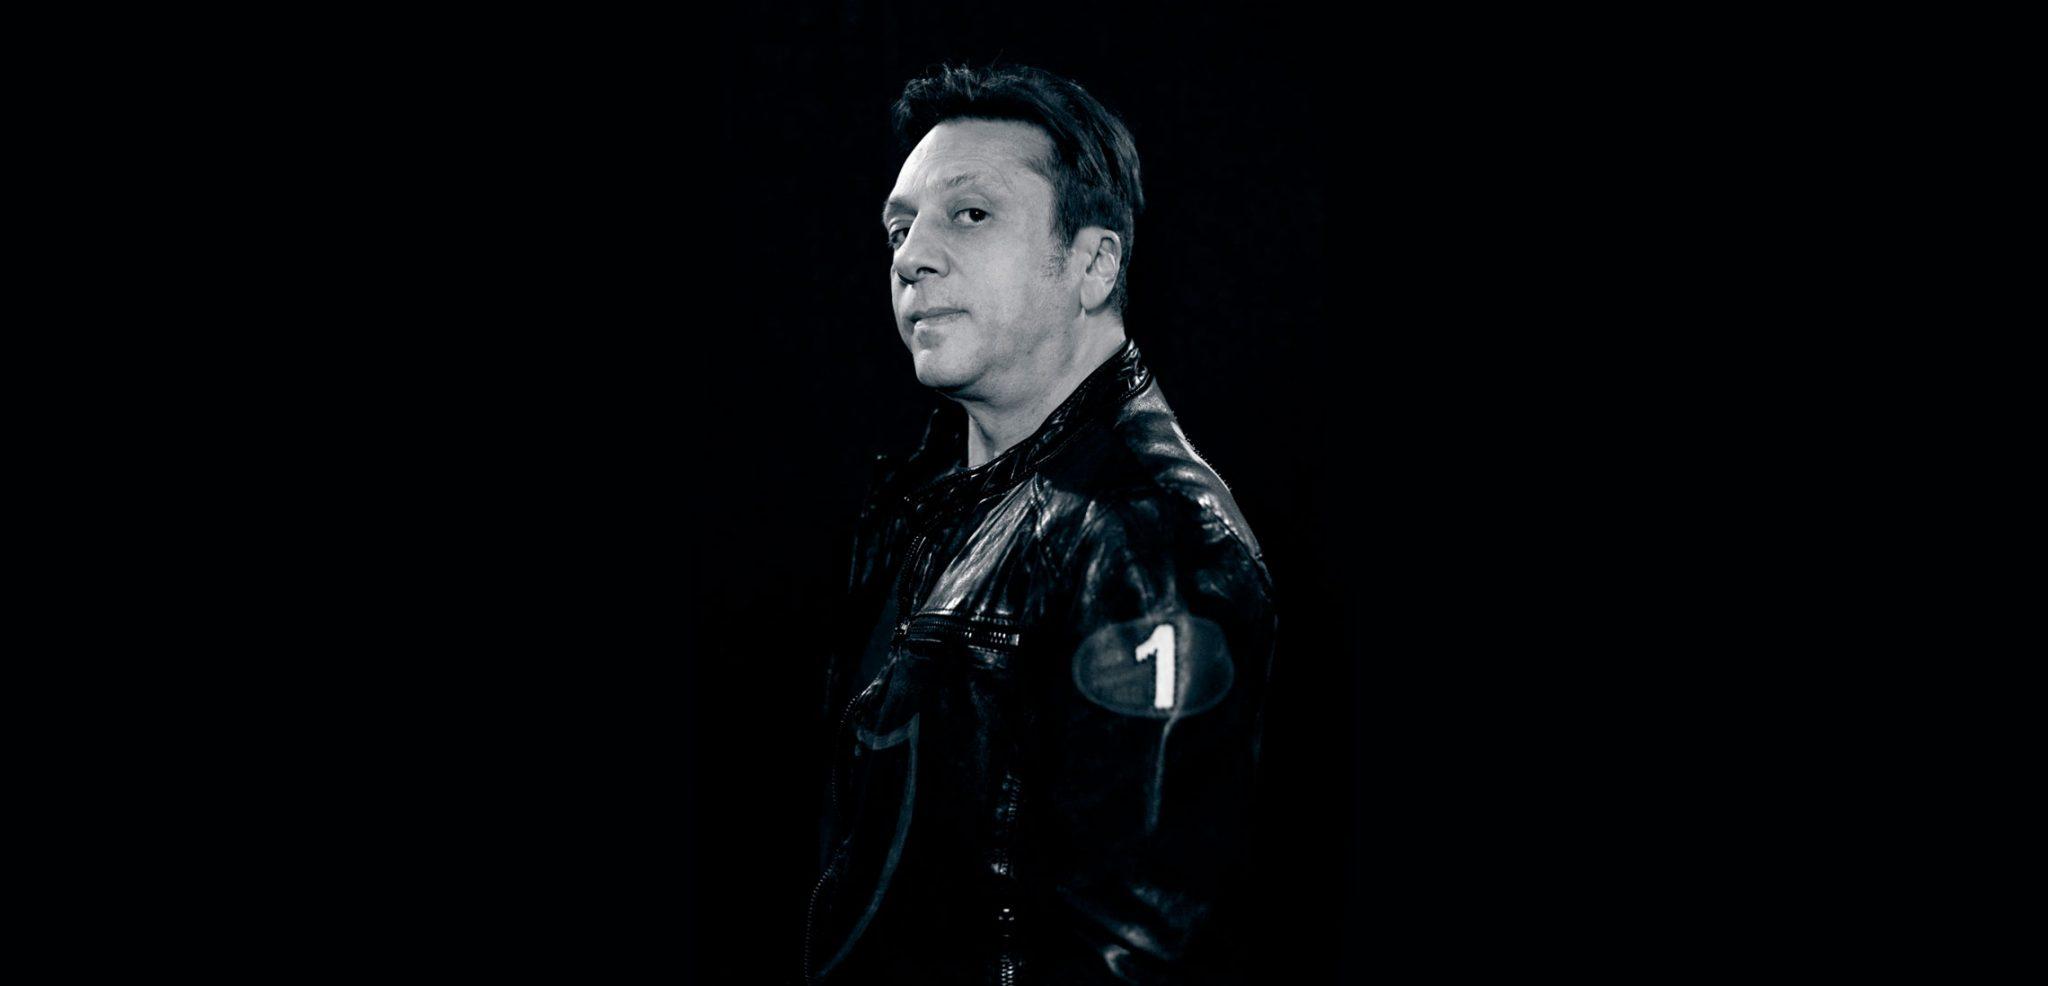 Paolo Martini - Bad Pitch EP hero